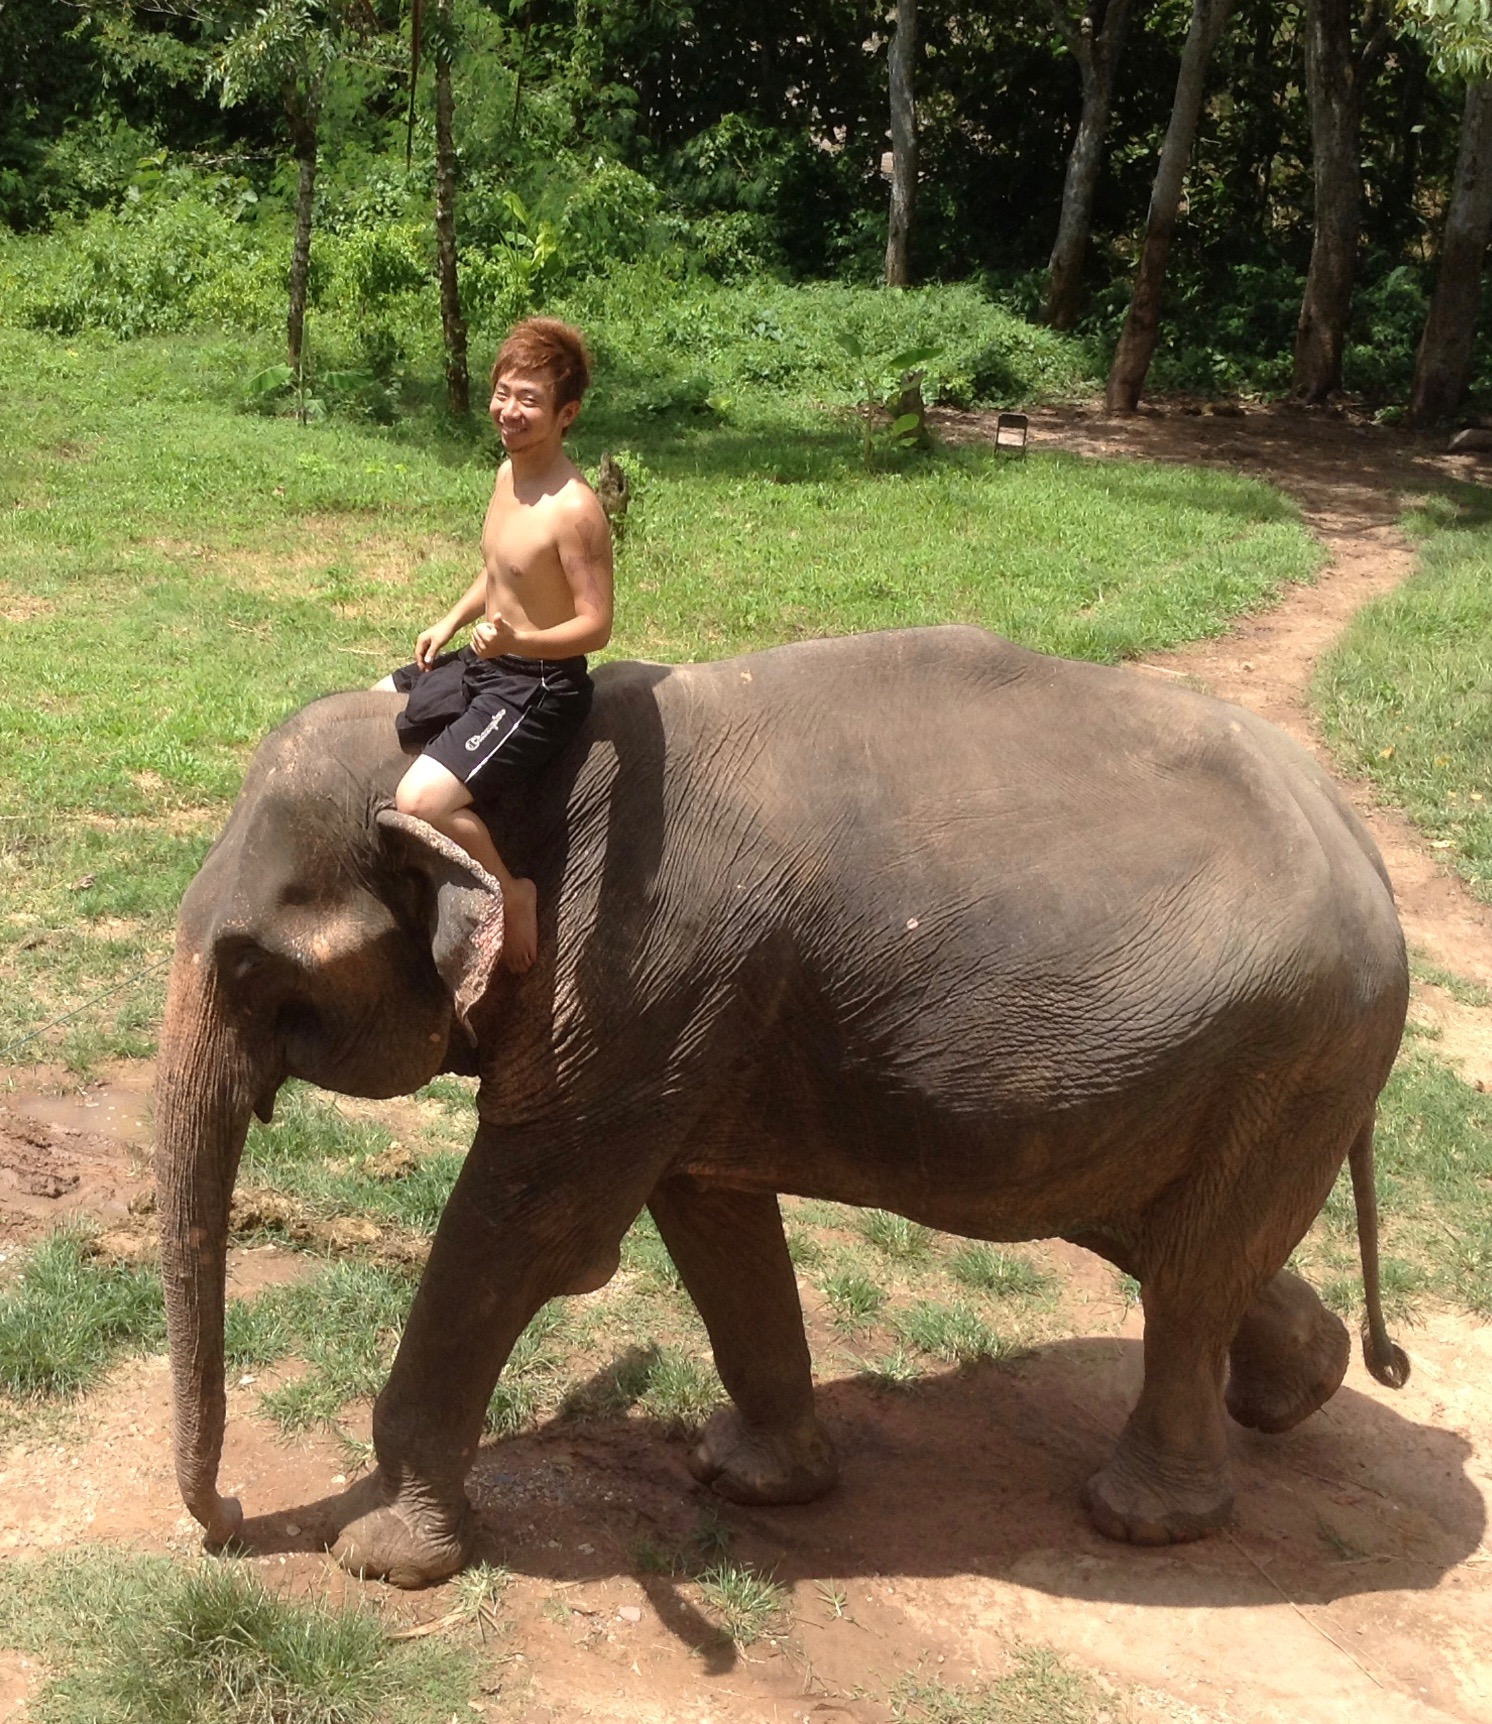 riding on elephant